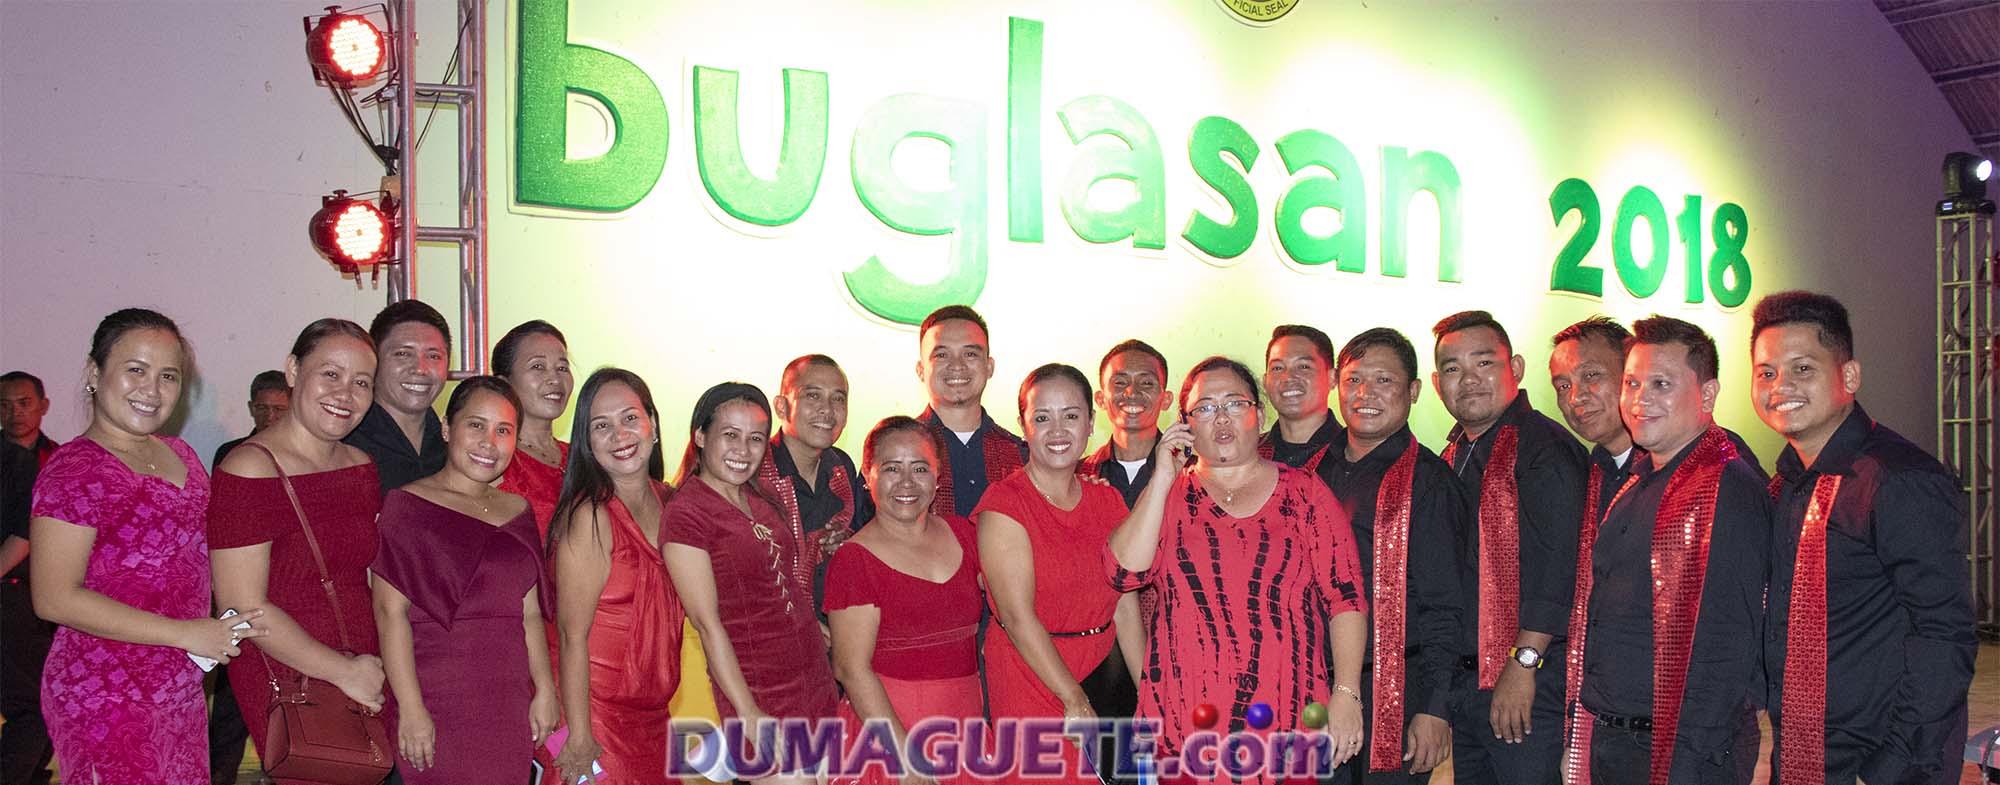 Rondalla, Balitaw and Balak Competition – Buglasan 2018